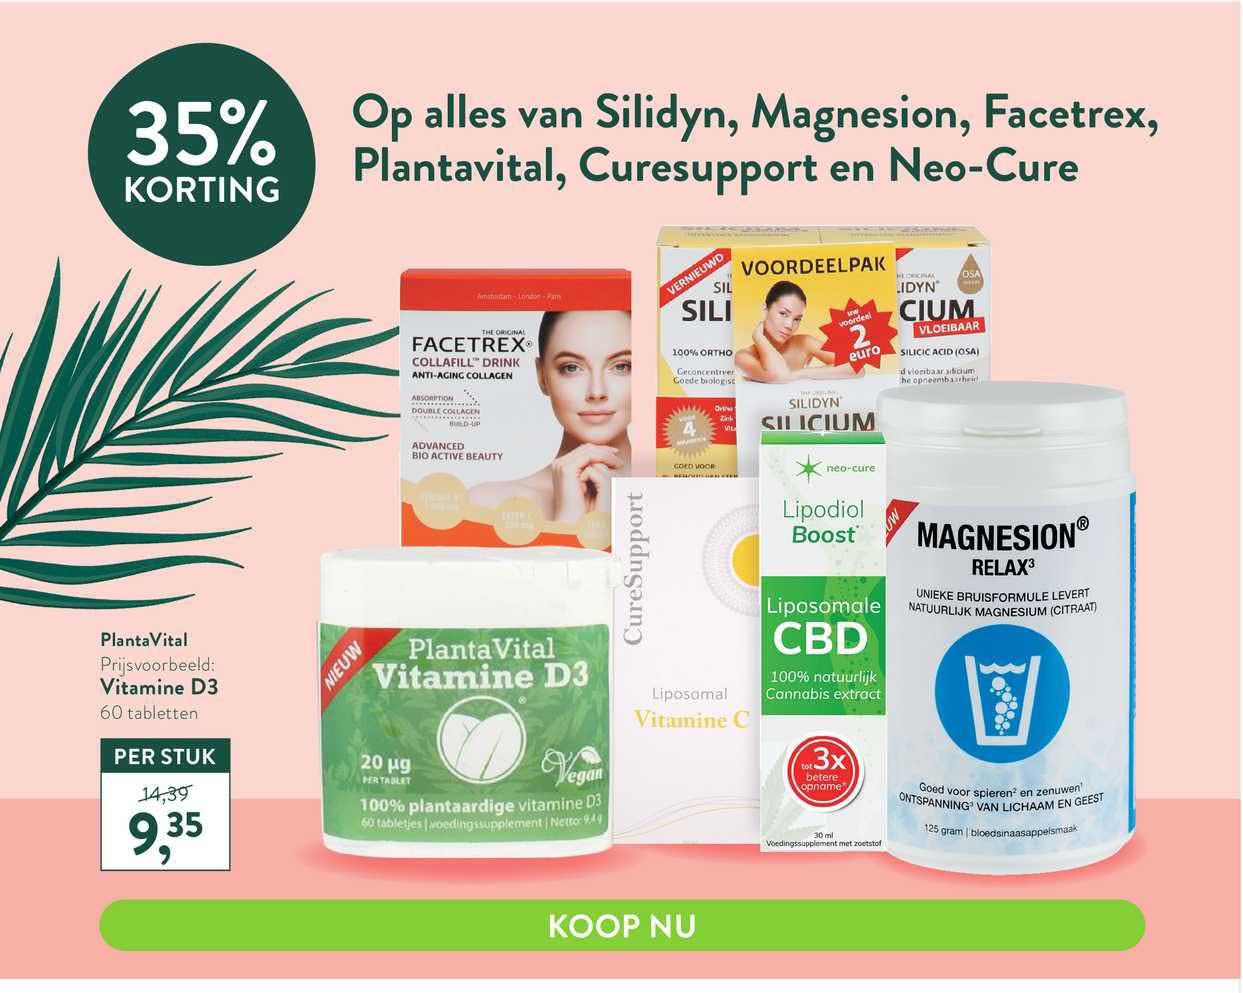 Holland & Barrett Op Alles Van Silidyn, Magnesion, Facetrex, Plantavital, Curesupport En Neo-Cure 35% Korting